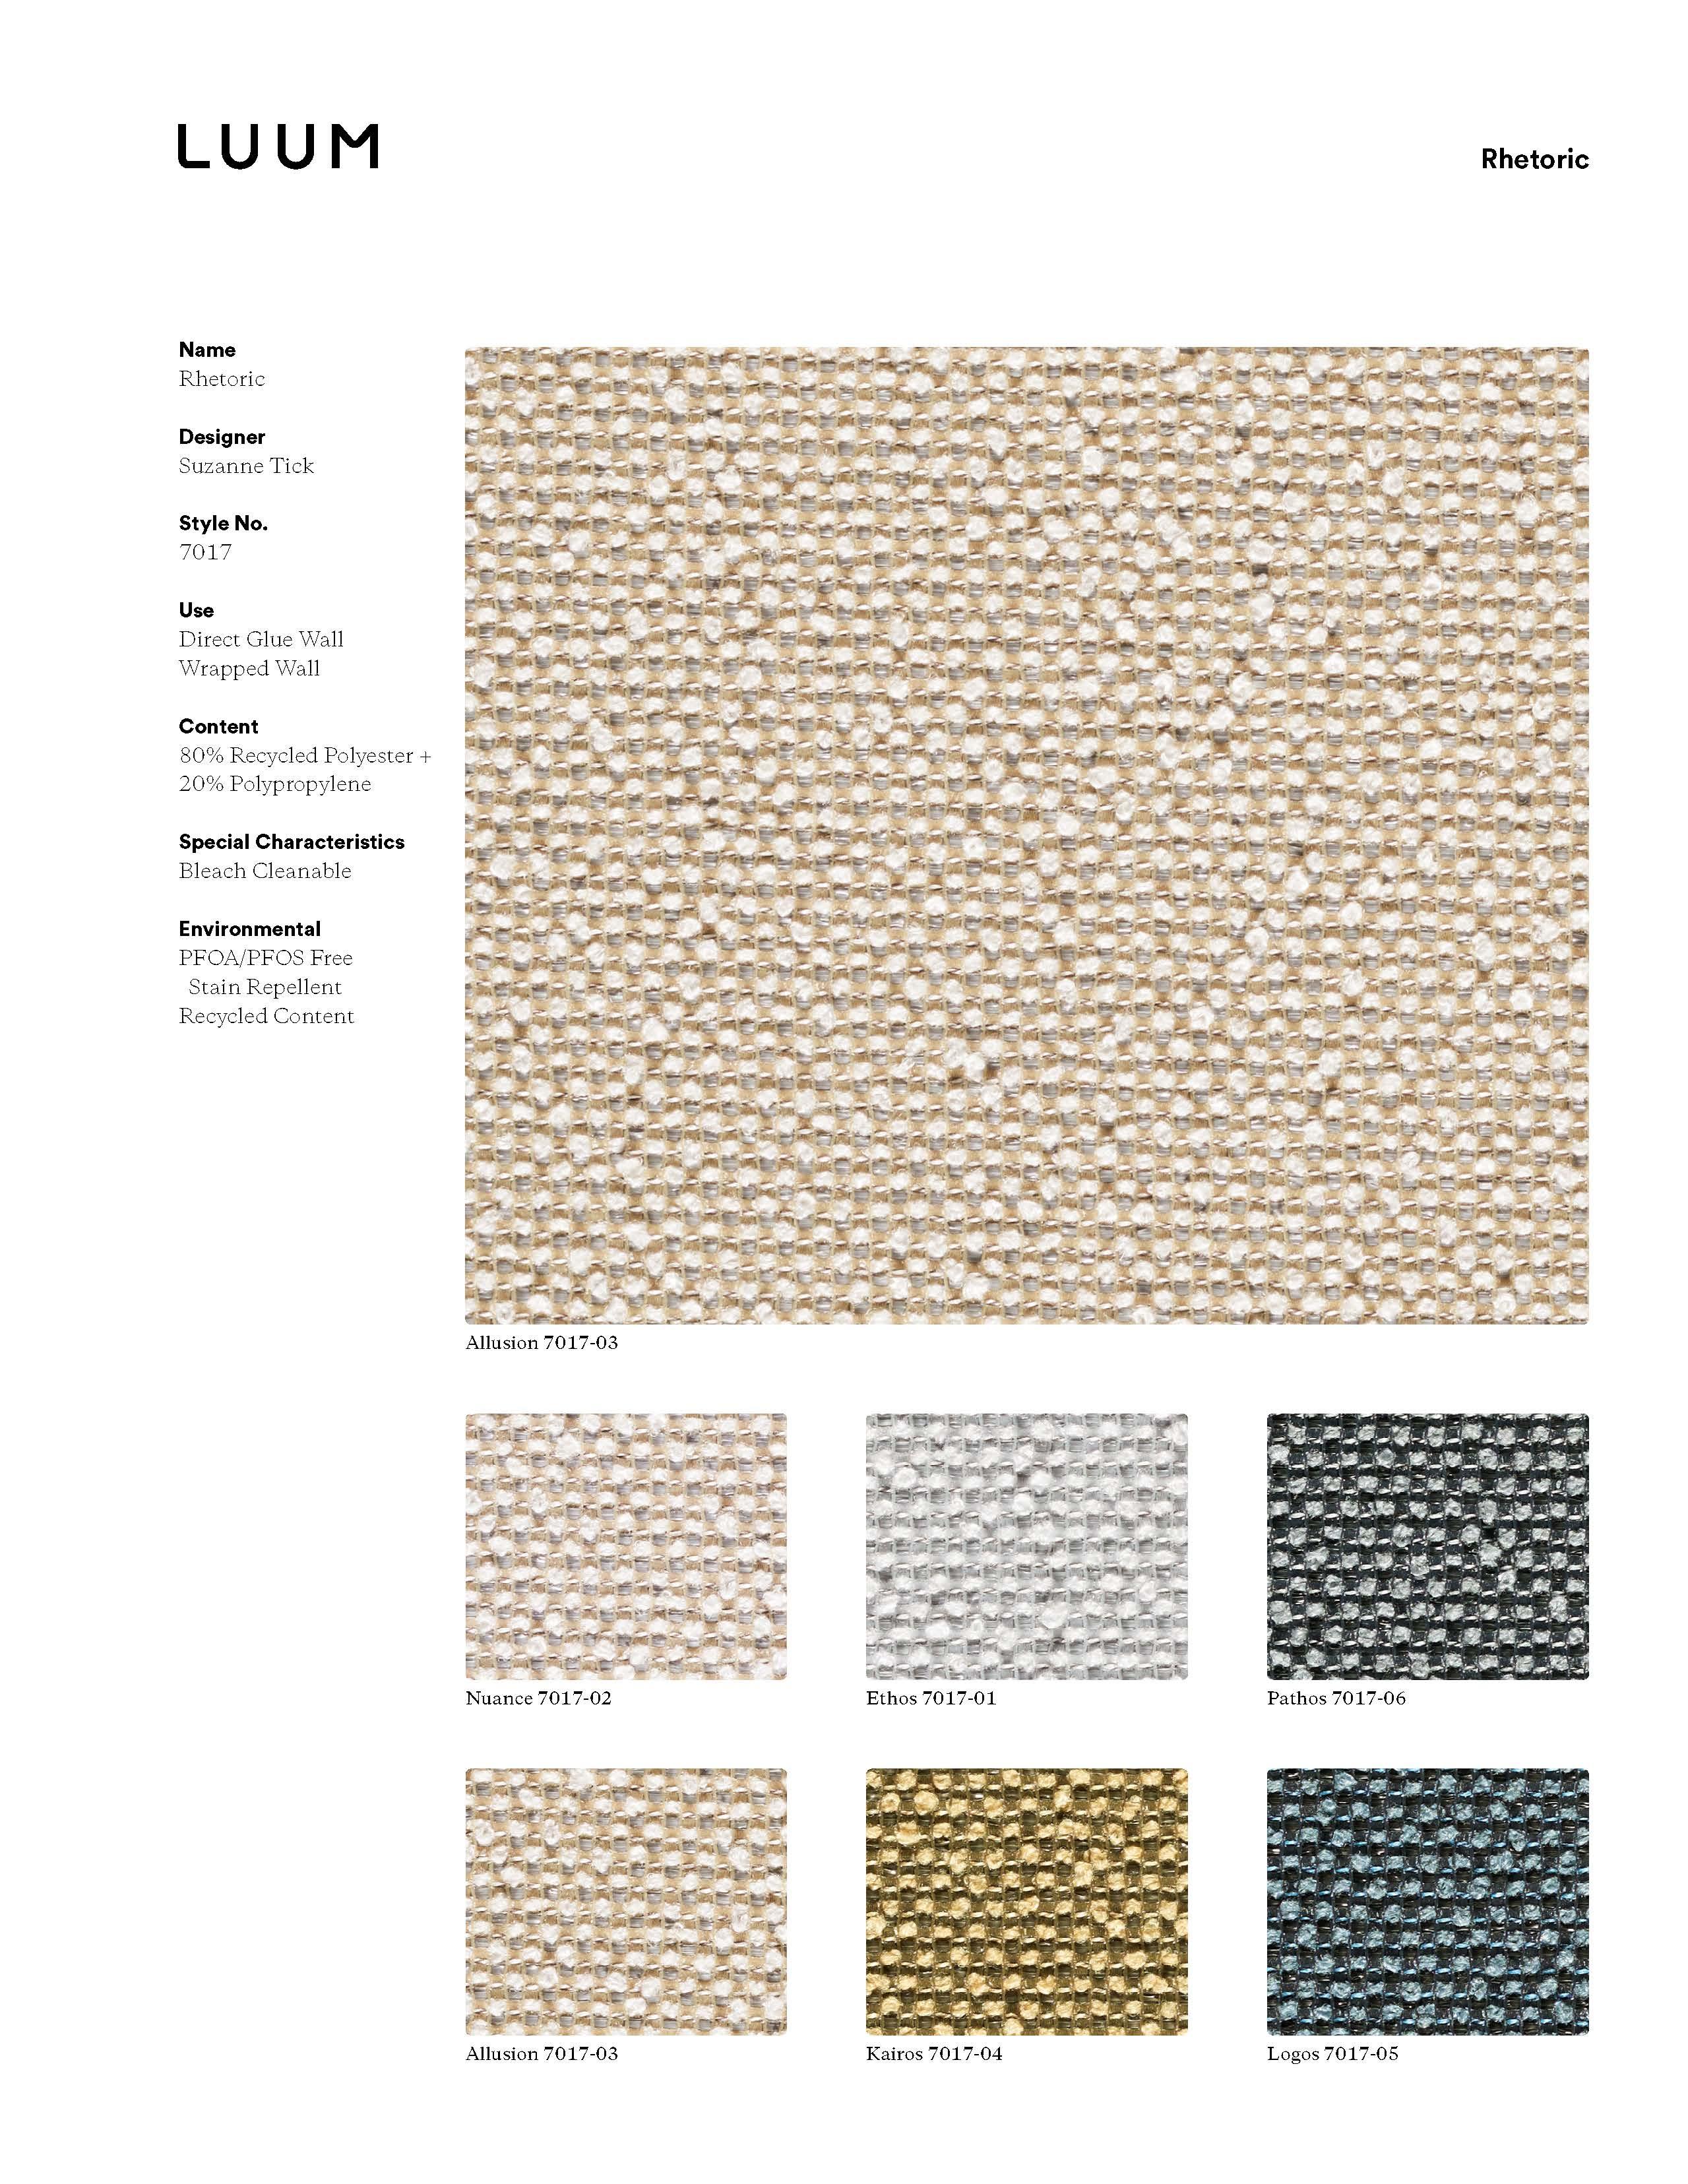 Rhetoric - Ethos - 7017 - 01 Sample Card